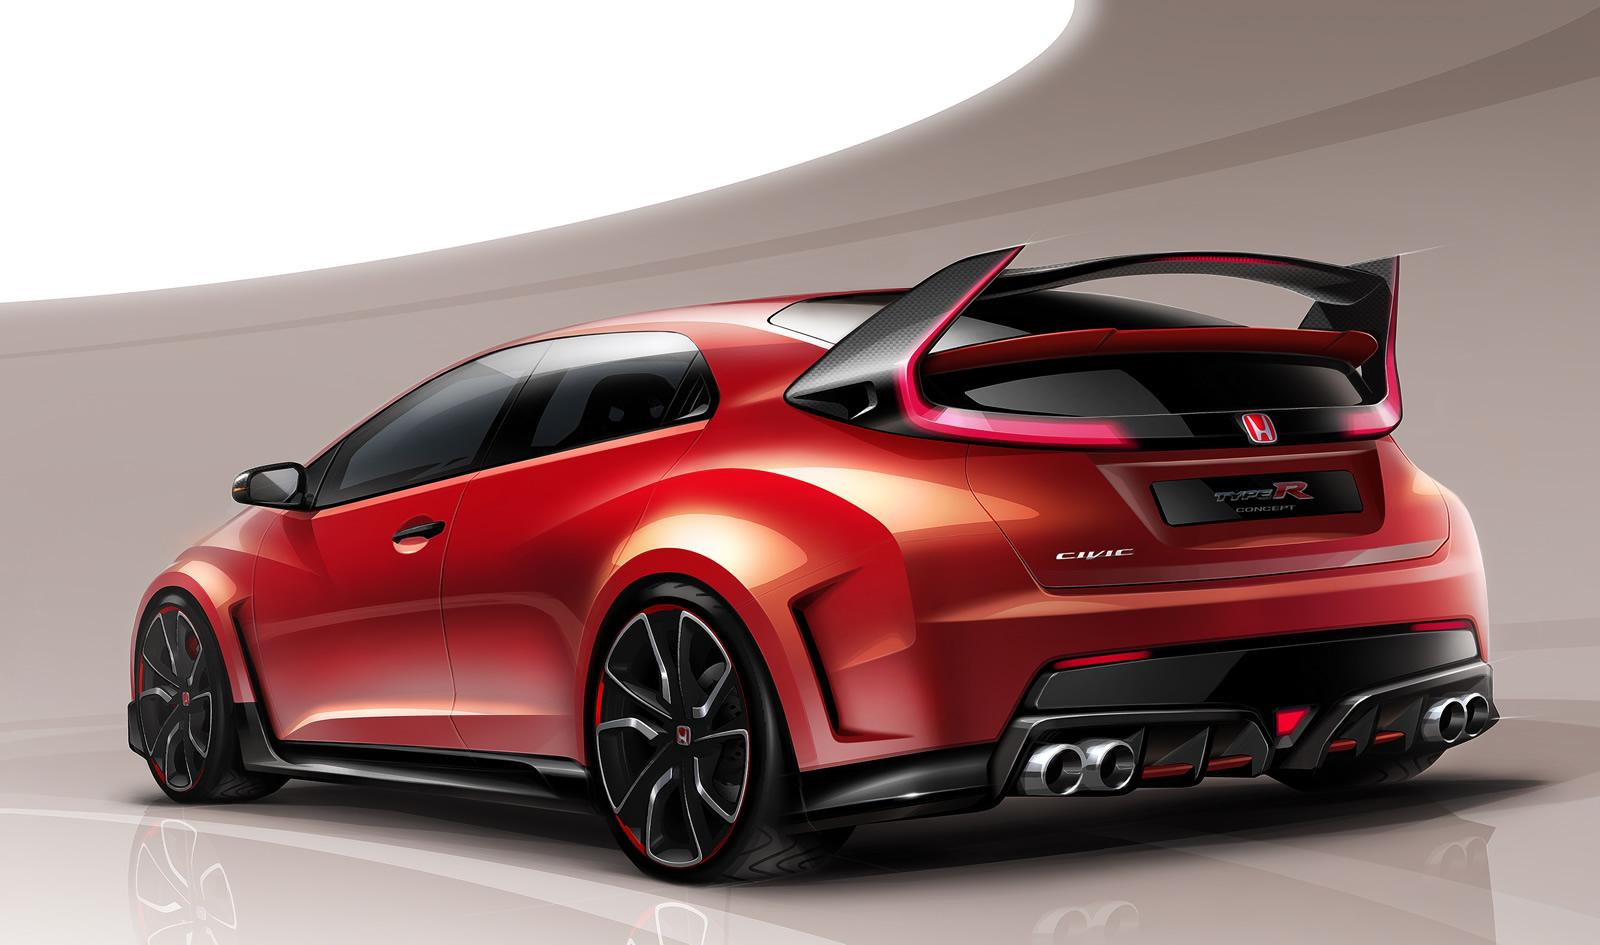 Honda Cars - News: 2015 Civic Type-R heading to Geneva